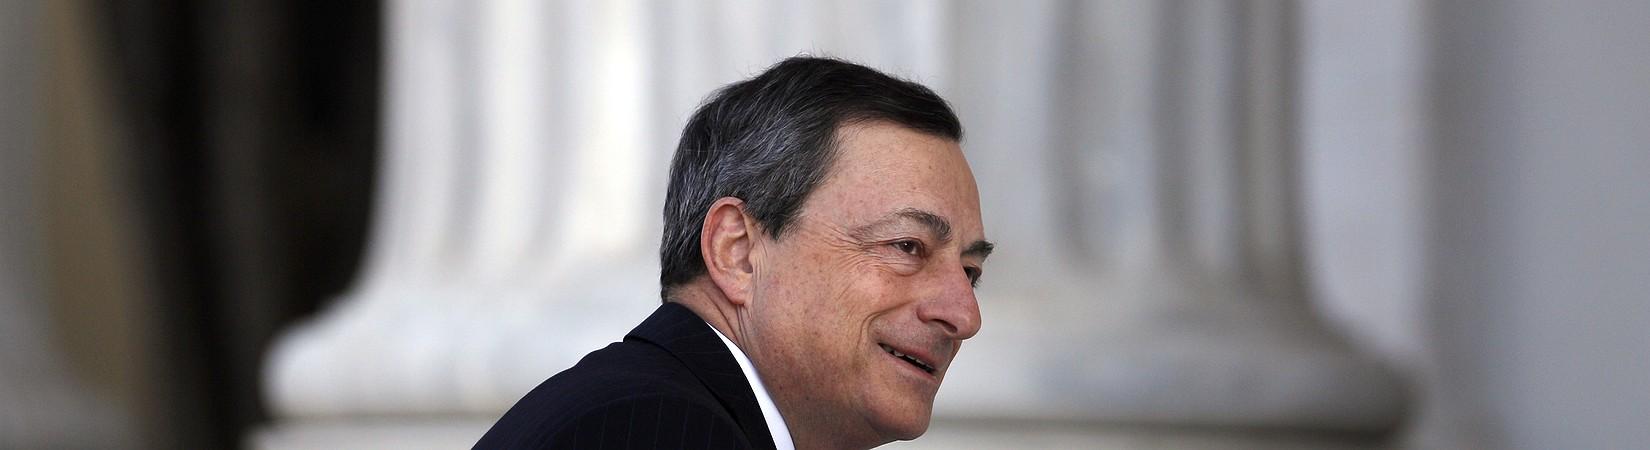 Borse europee piatte in attesa di Draghi